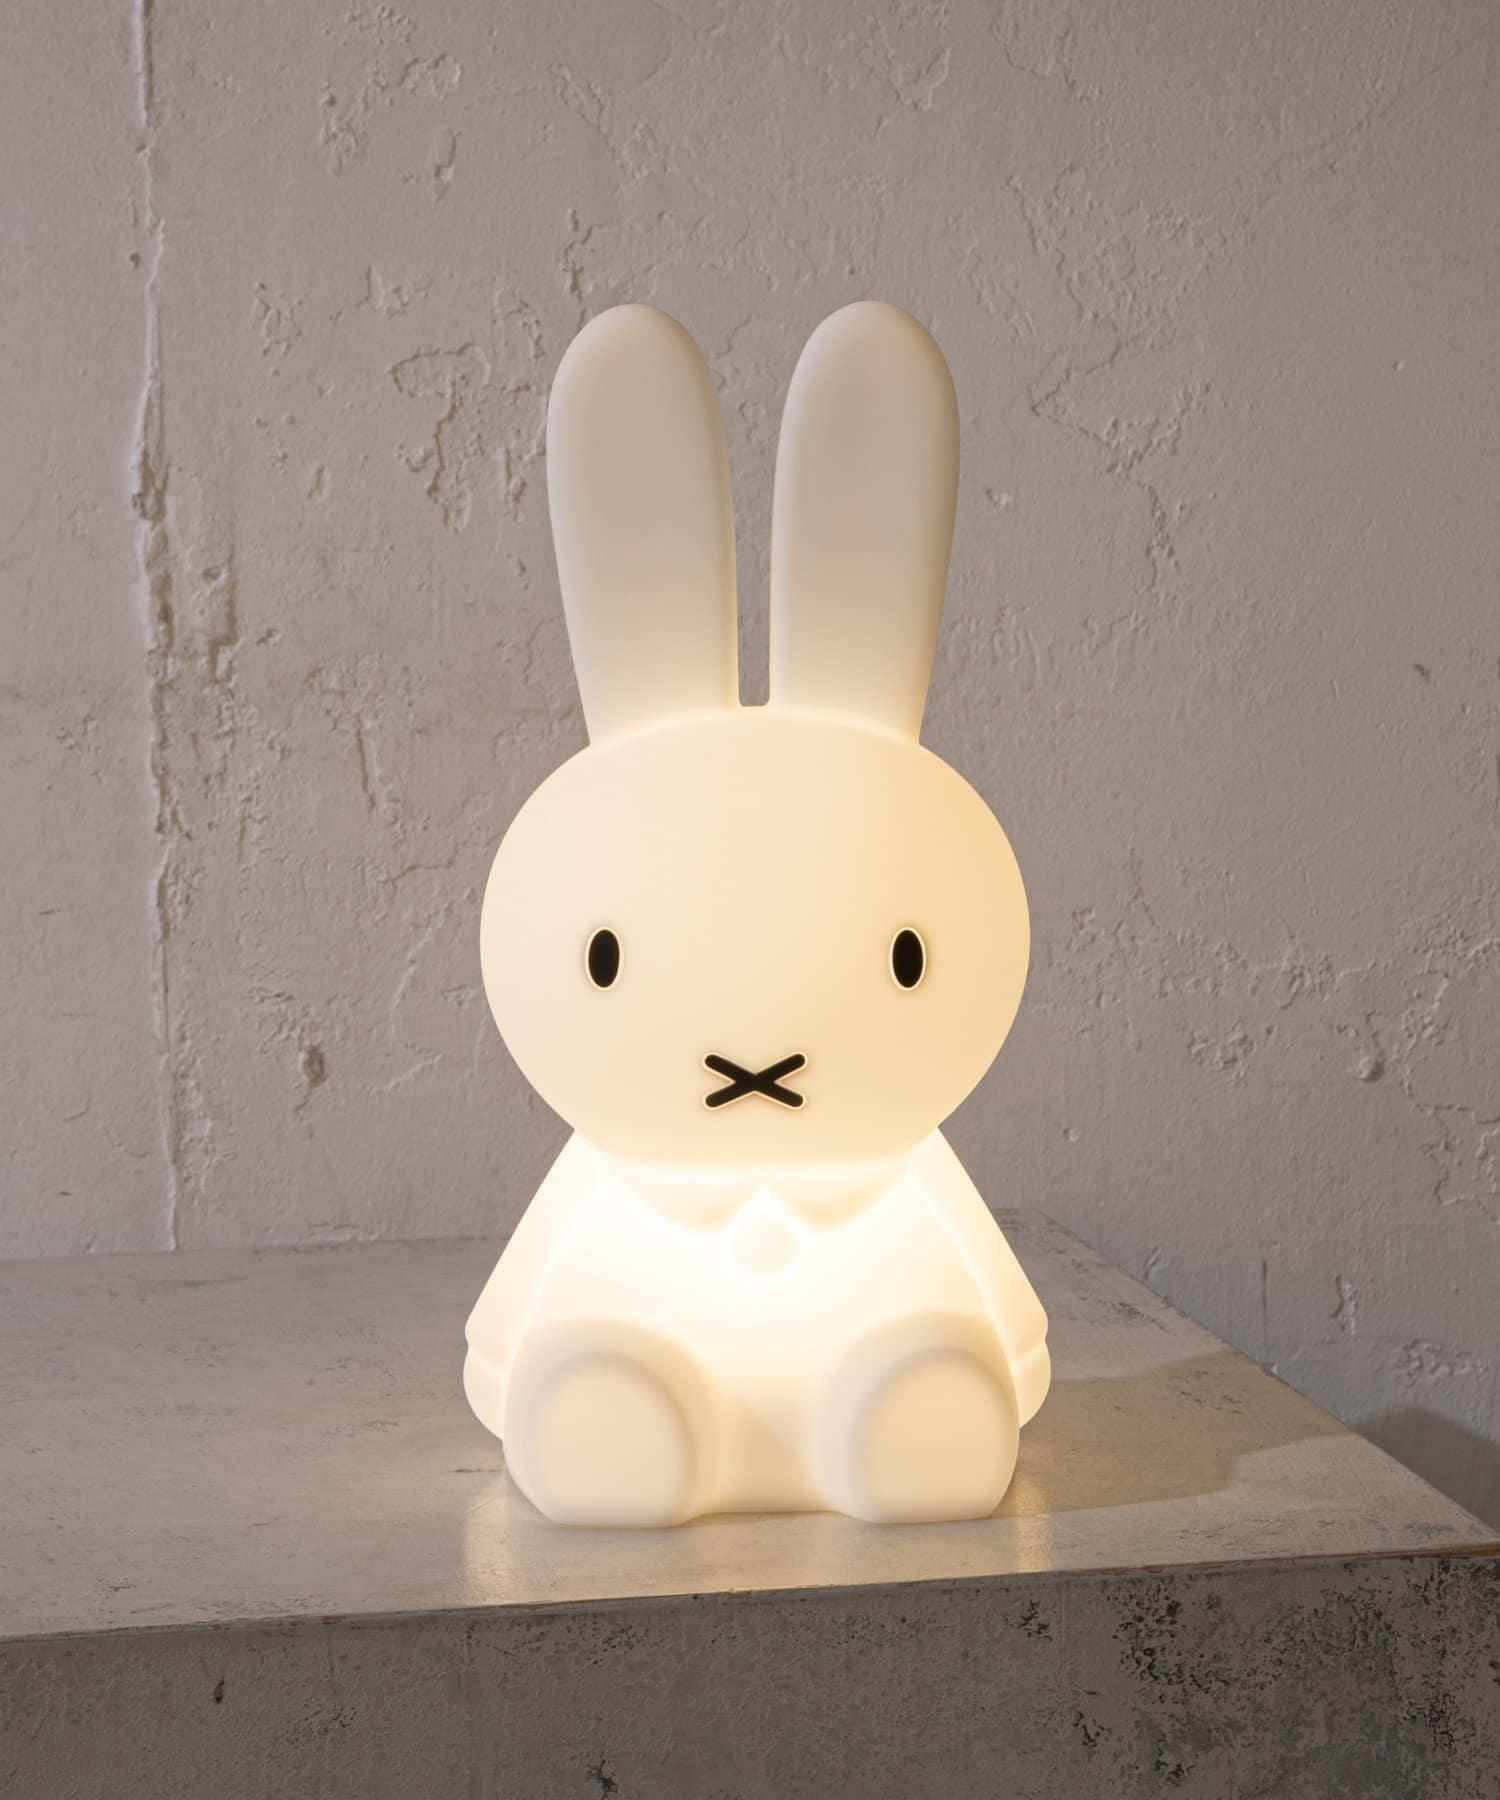 Discoat(ディスコート) ライフスタイル FIRST LIGHT miffy and friends ホワイト